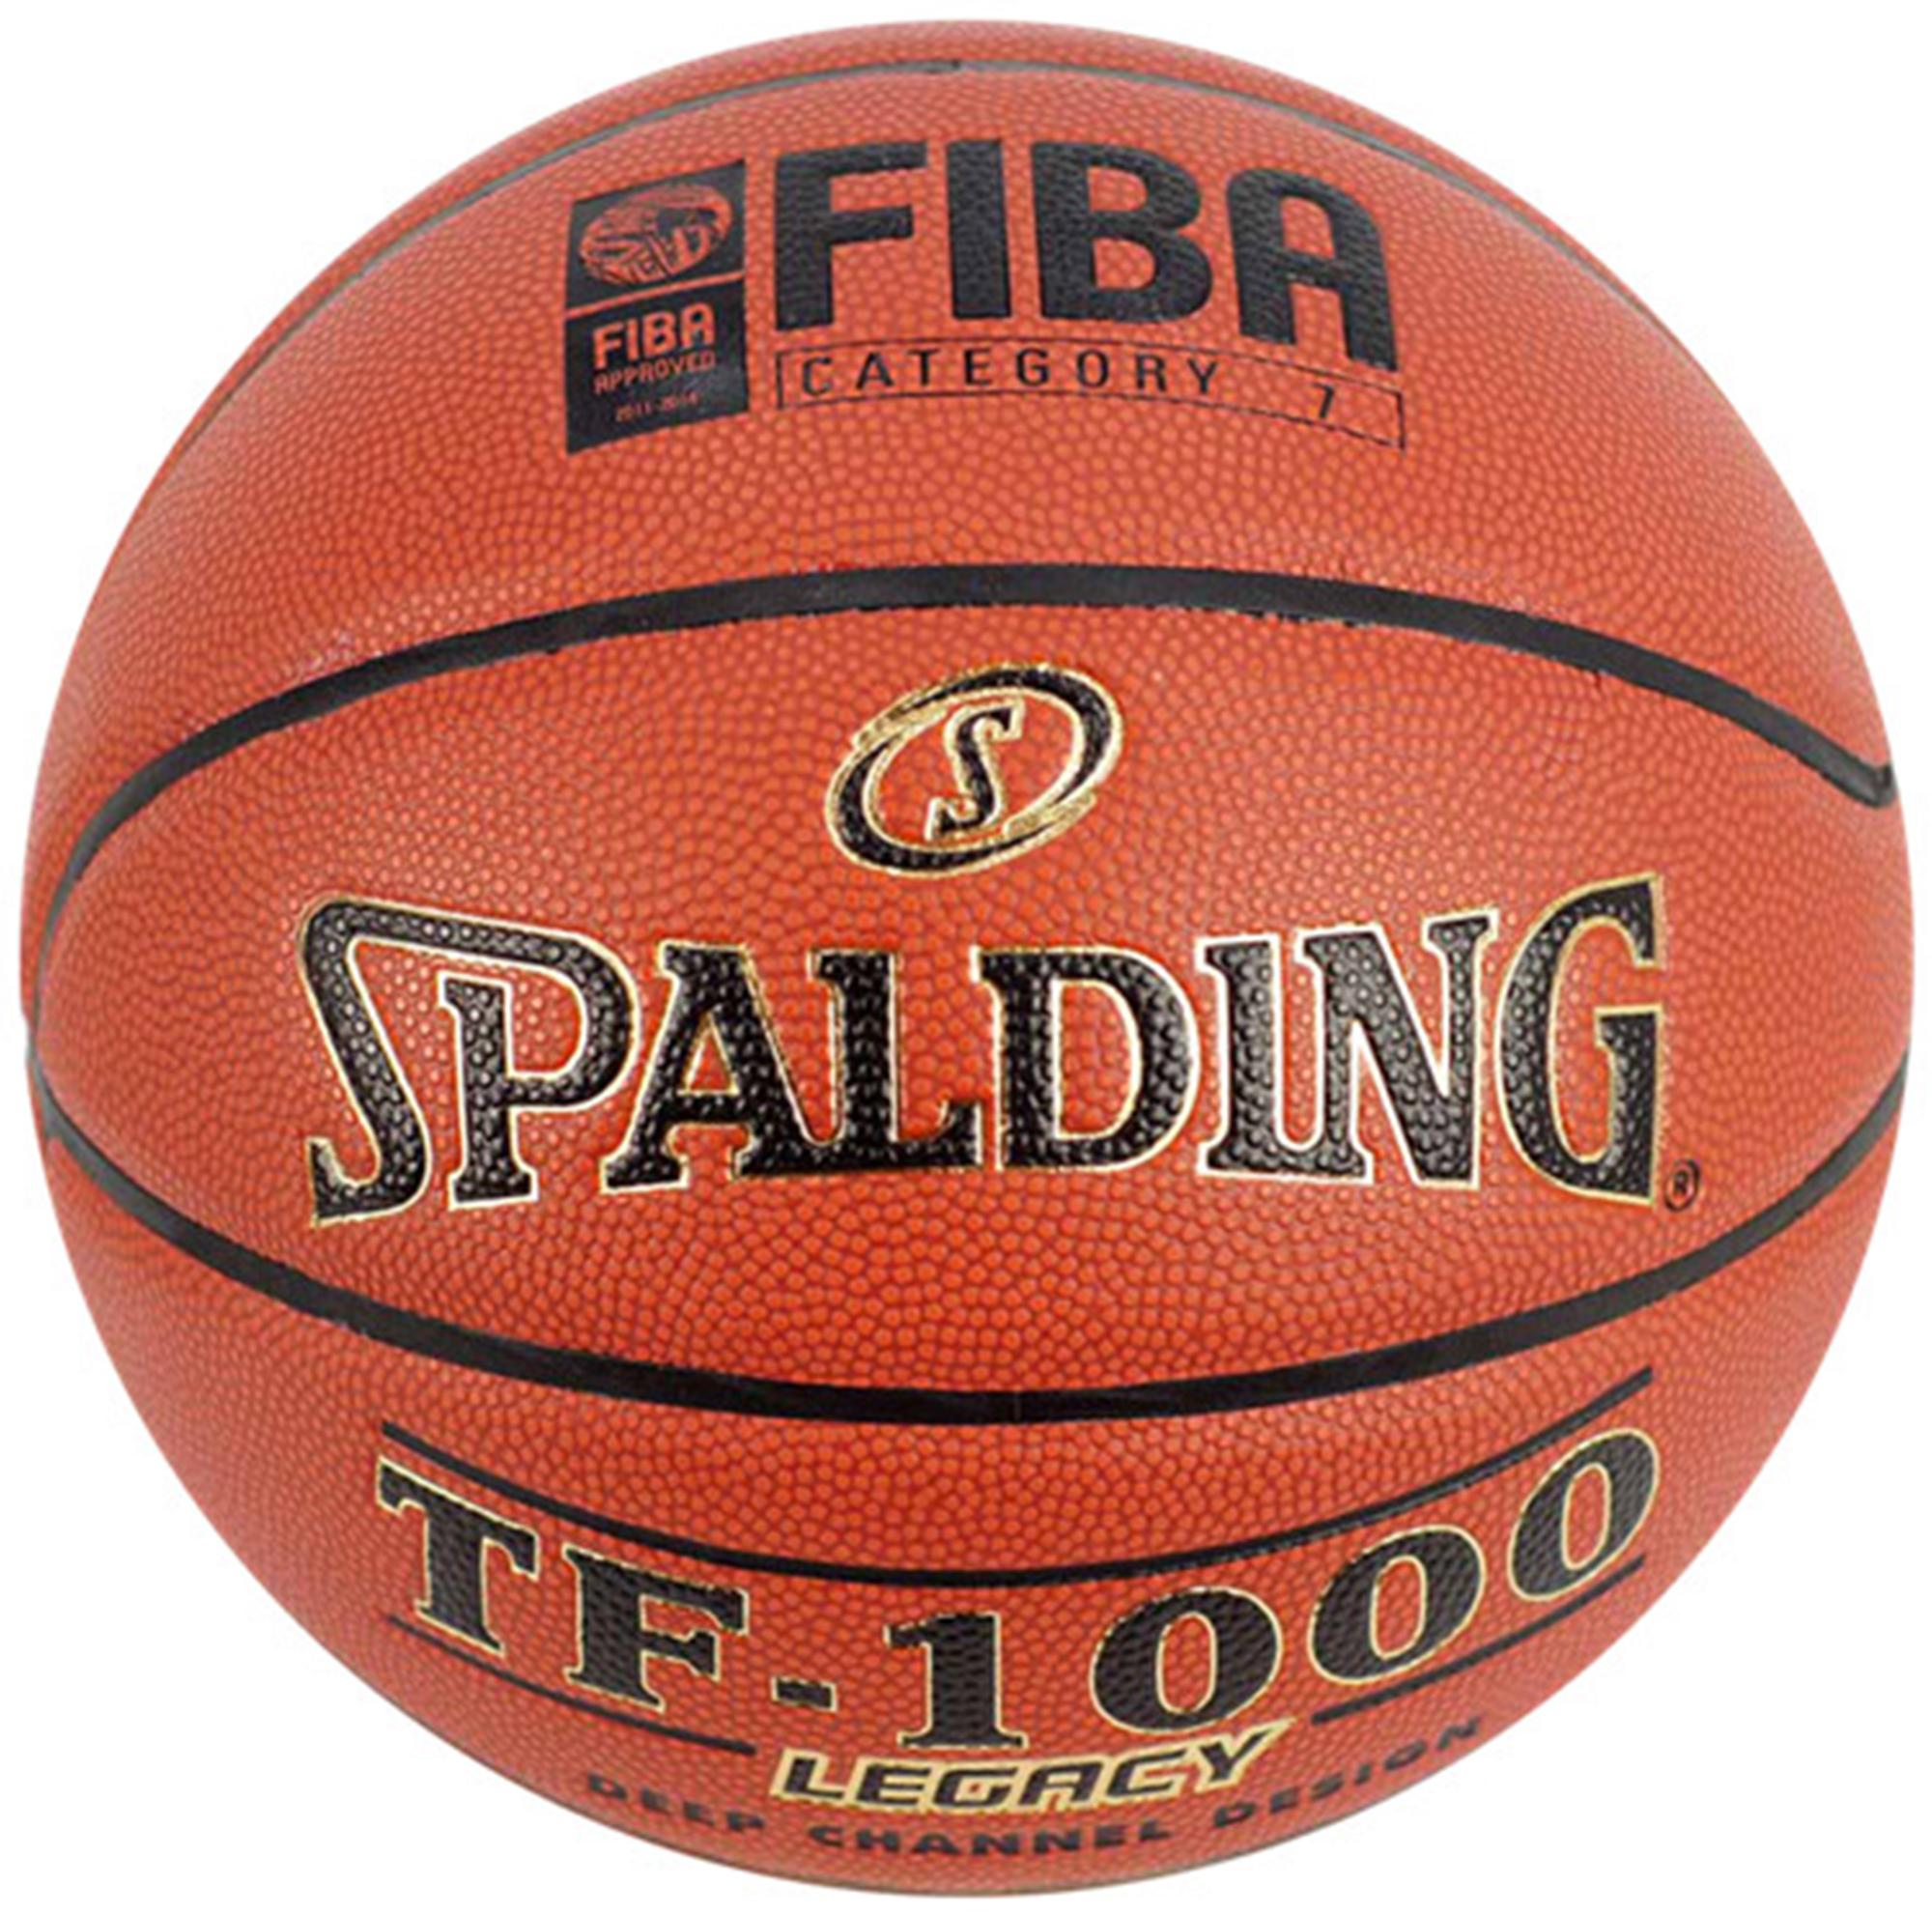 Spalding Мяч баскетбольный TF-1000 Legacy FIBA